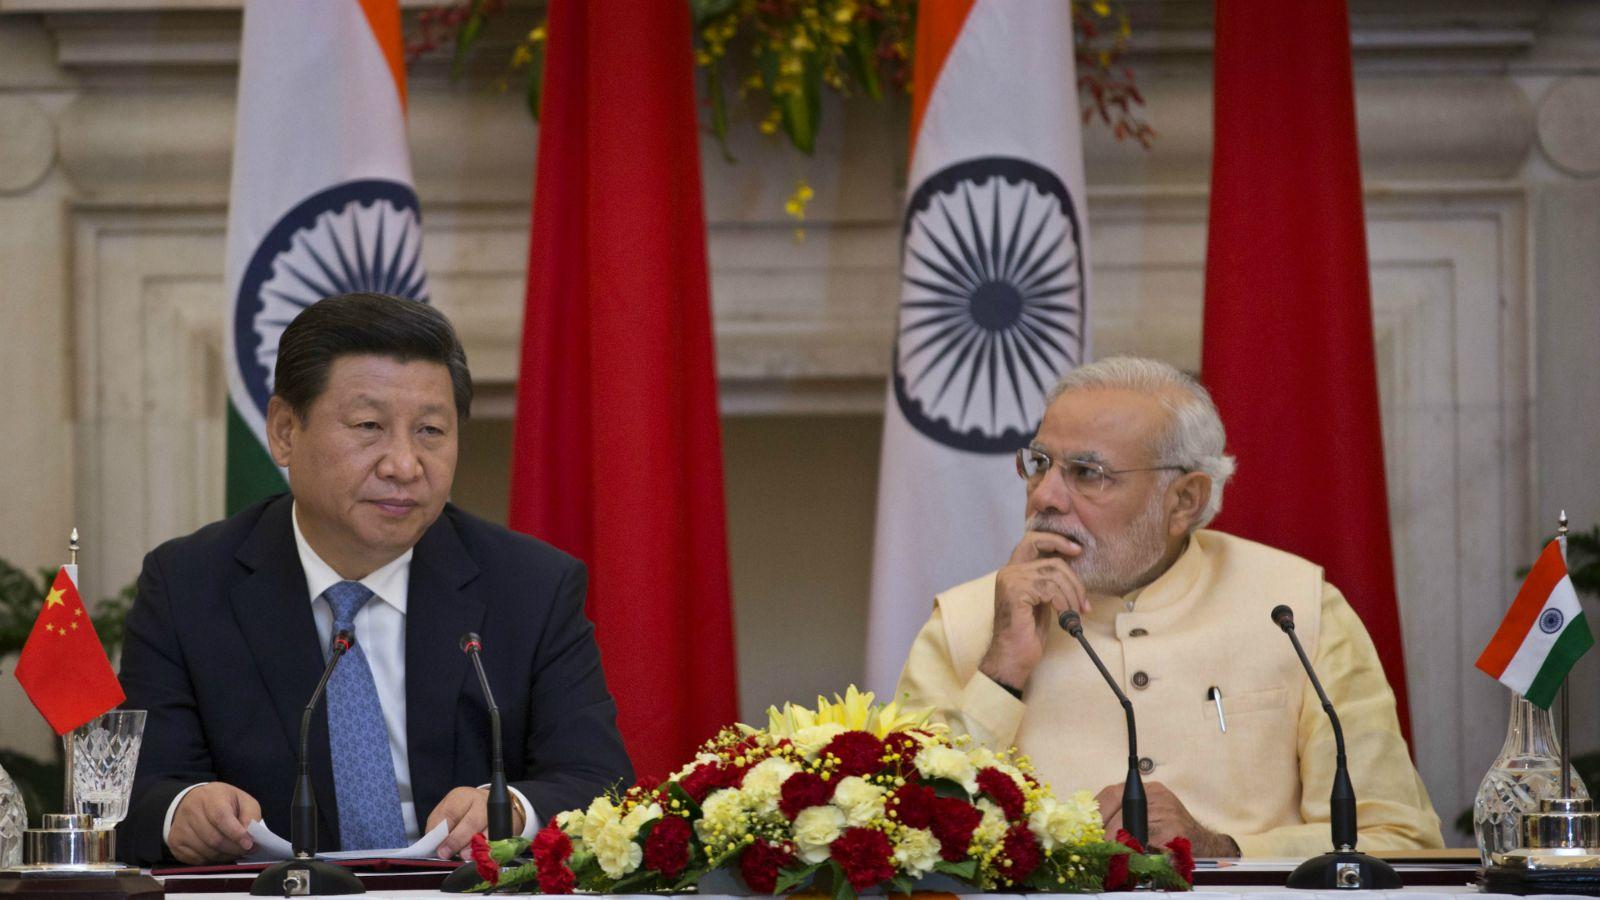 India-Modi-China-Asia-Popular-Pew